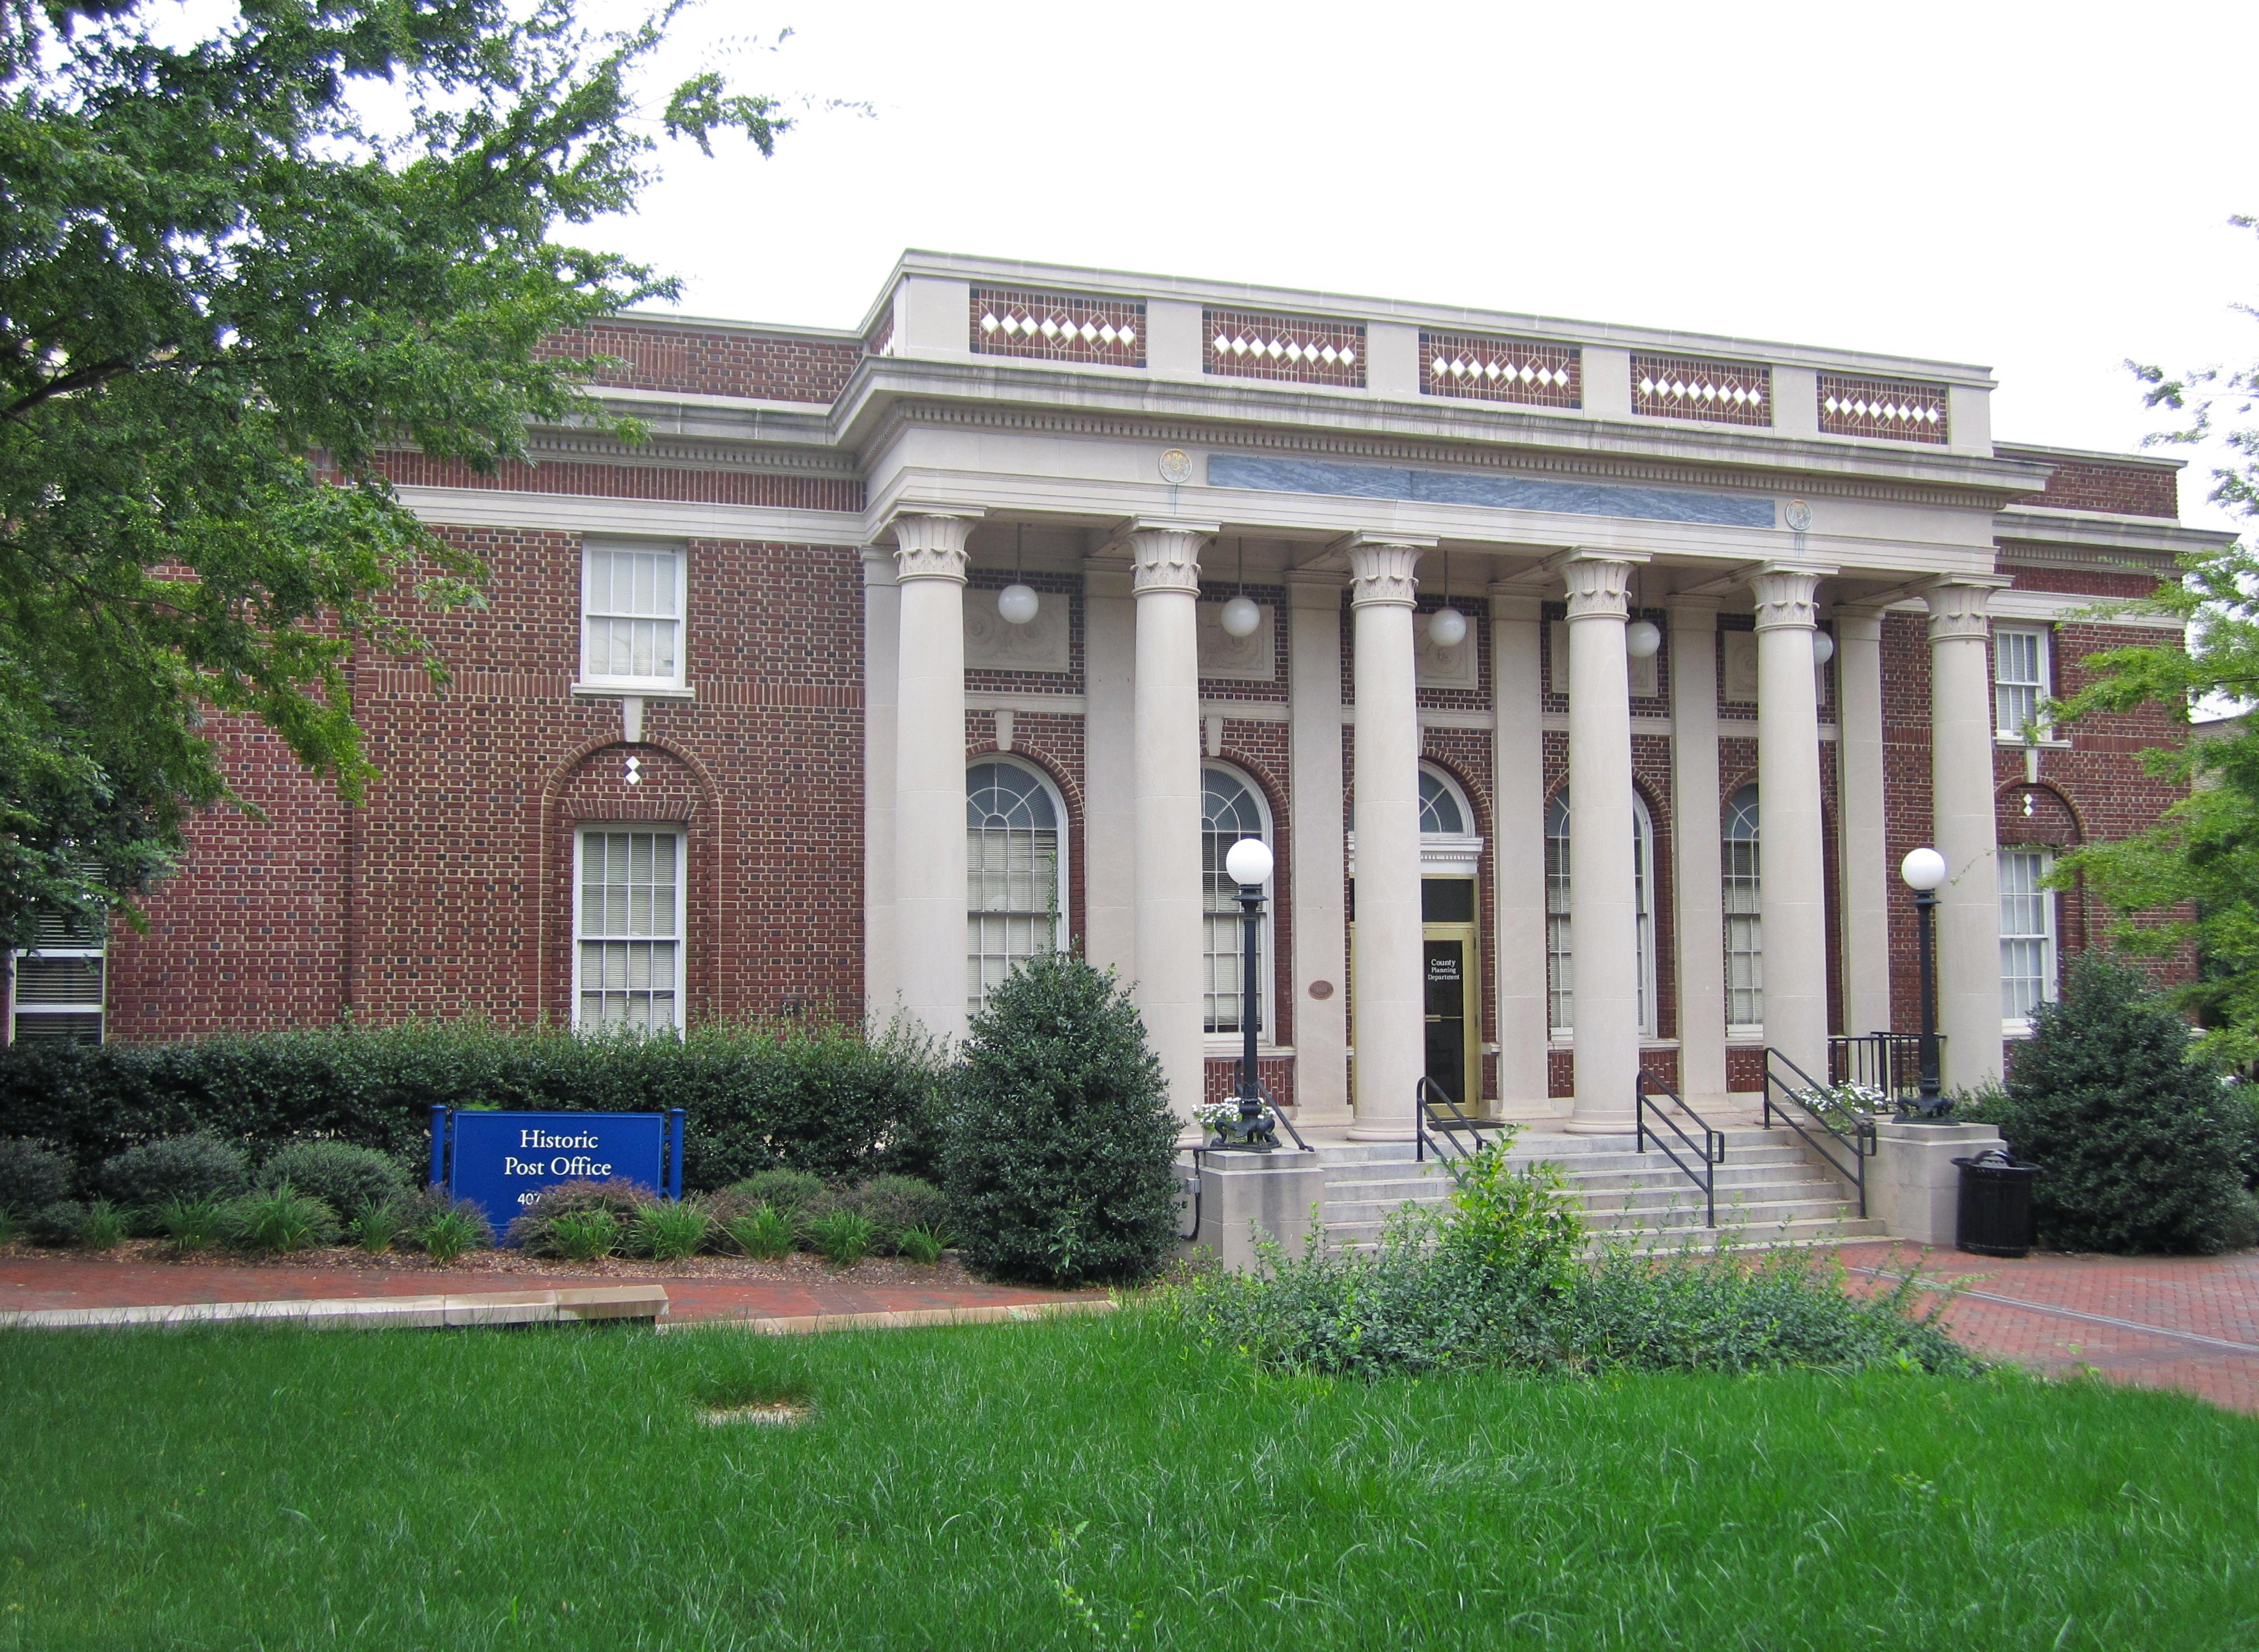 File:Impressive architectural details grace the Old US Post